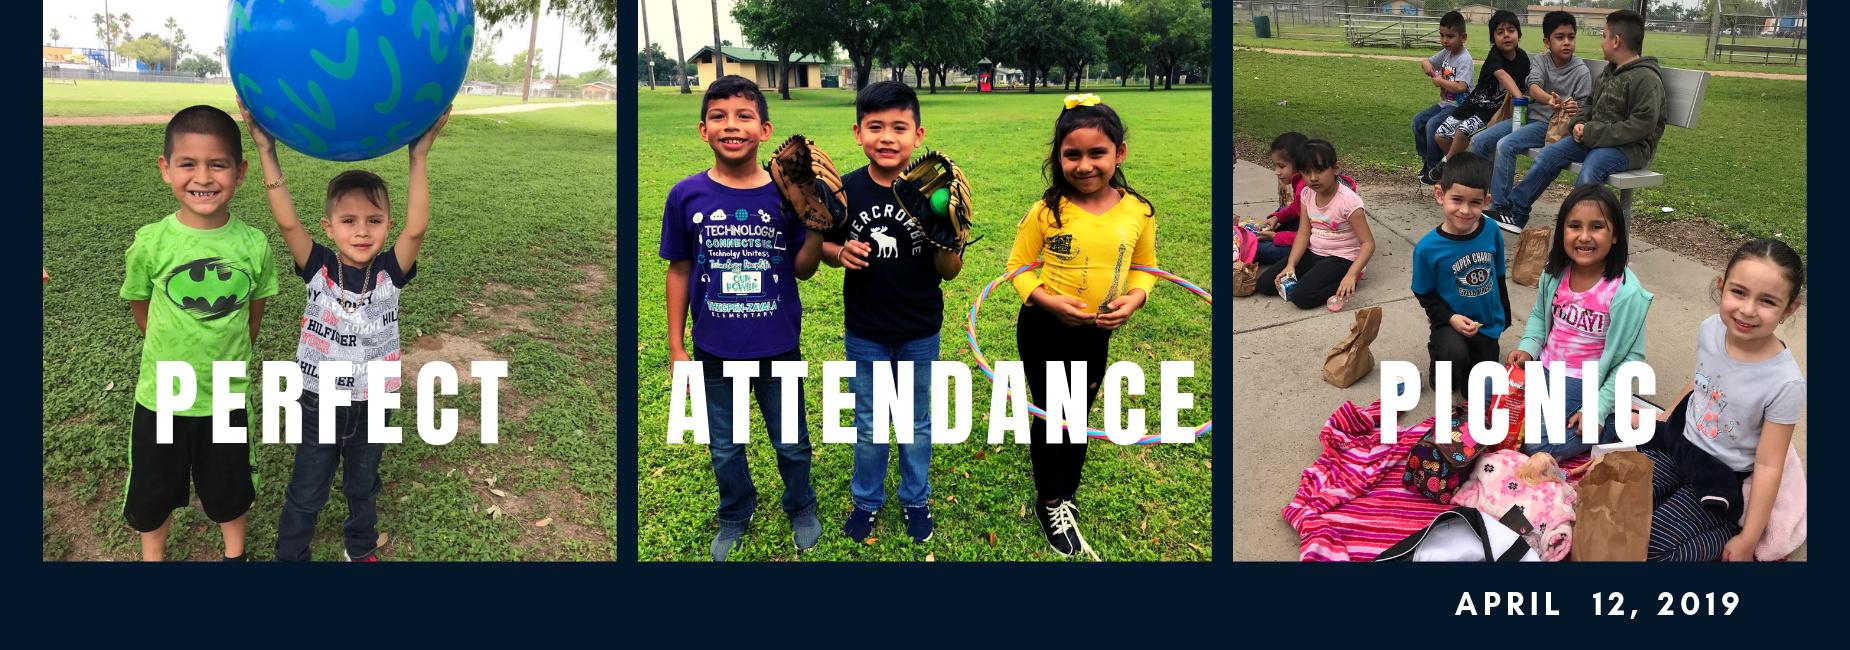 Attendance Picnic